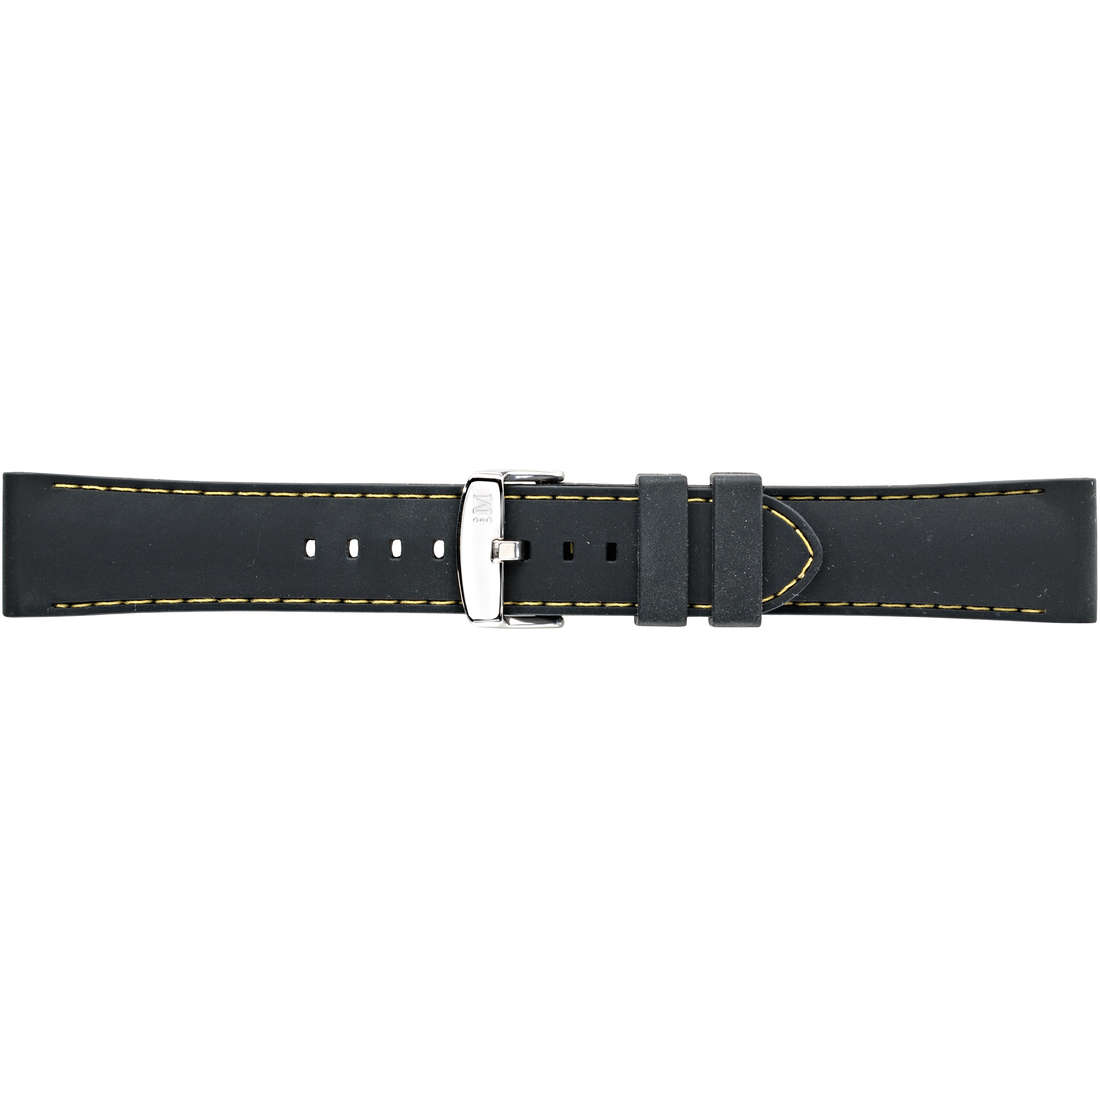 watch watch bands watch straps man Morellato Technogomma A01U3844187897CR20